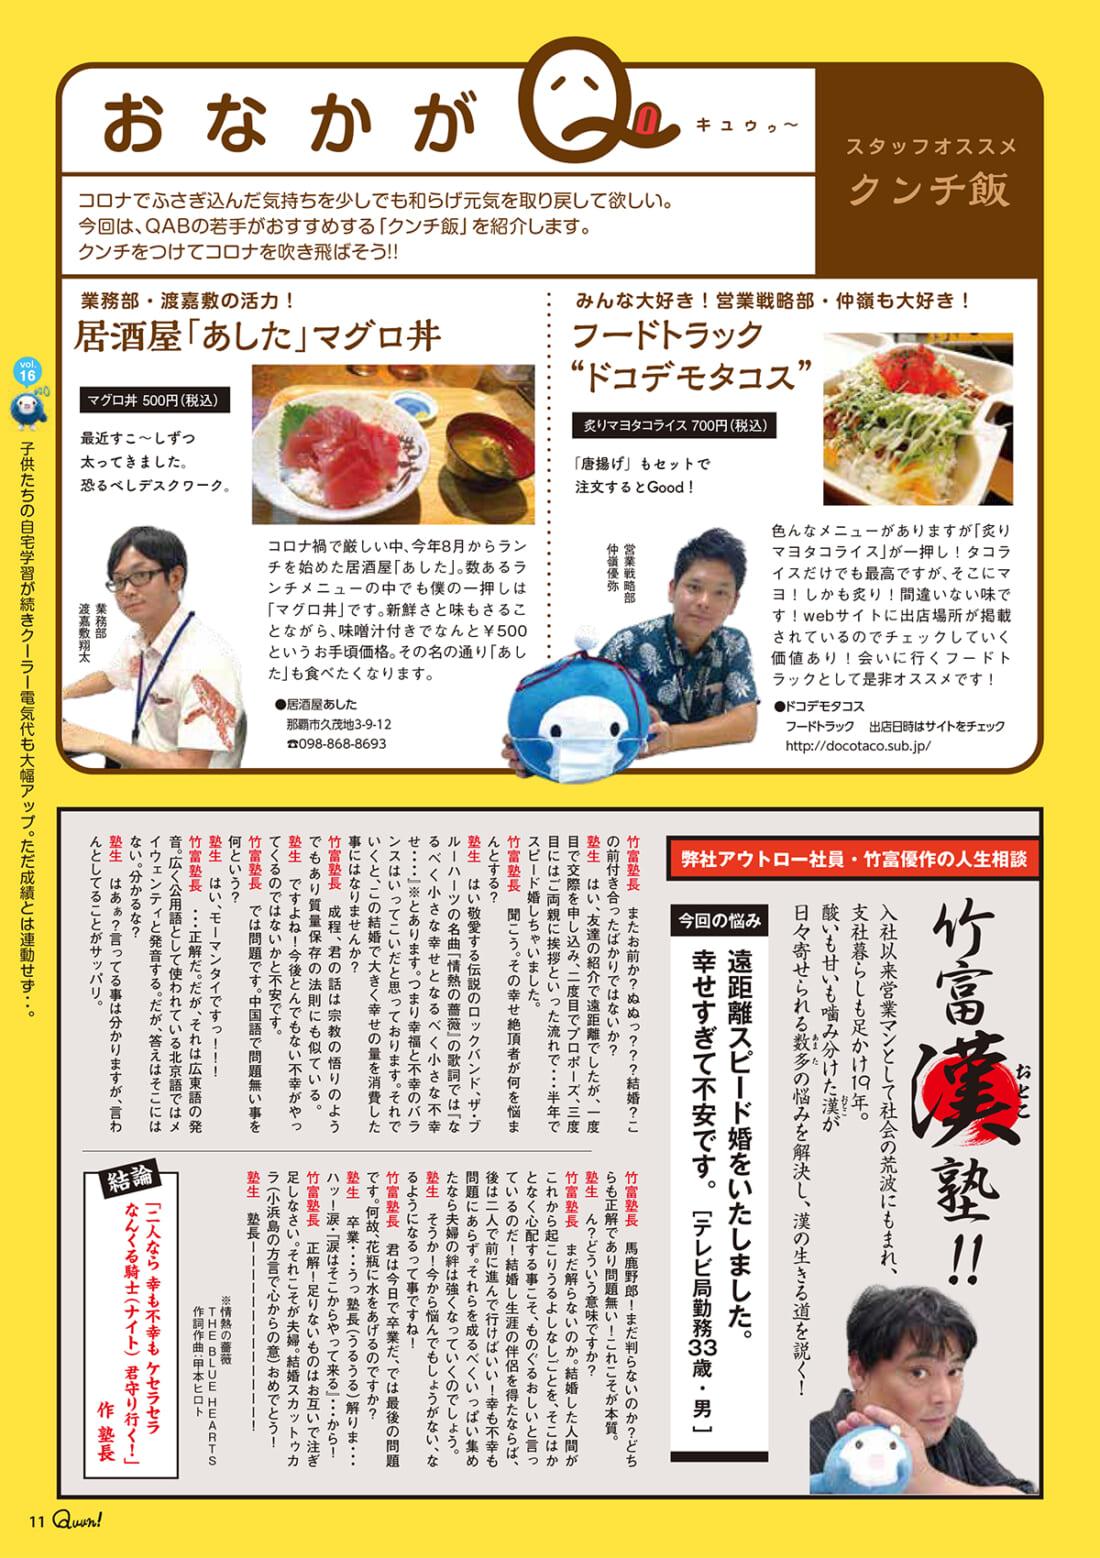 https://www.qab.co.jp/qgoro/wp-content/uploads/quun_1613-1100x1558.jpg